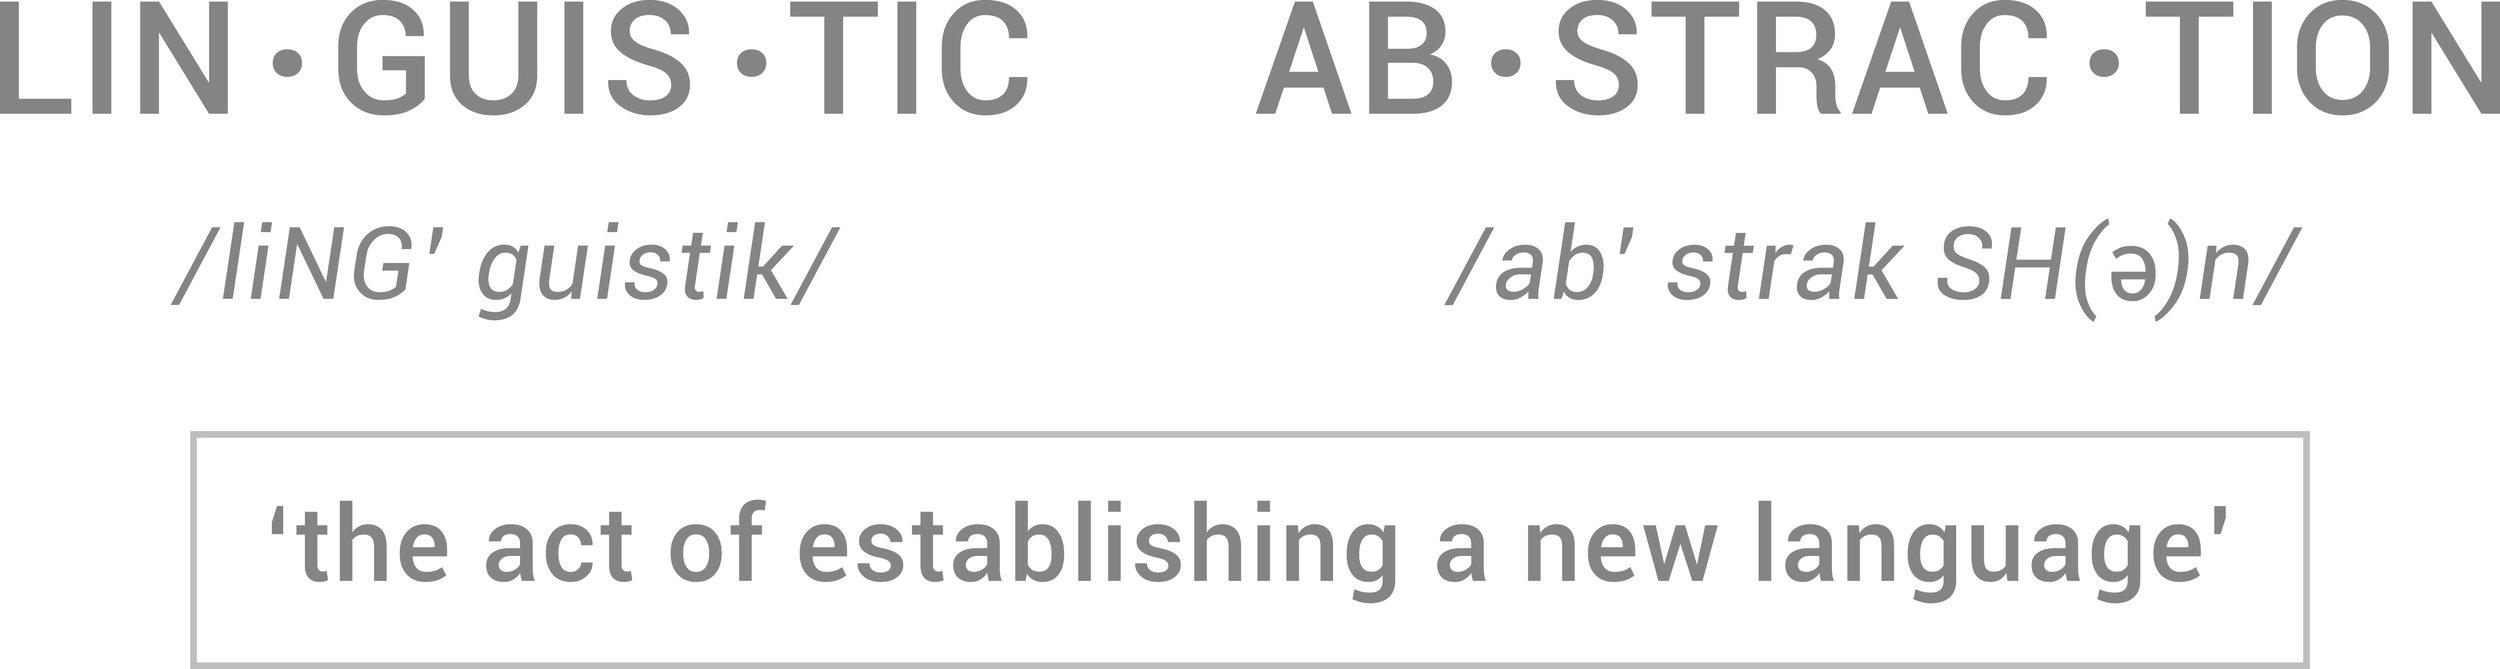 Linguistic-Dictionary-Def.jpg